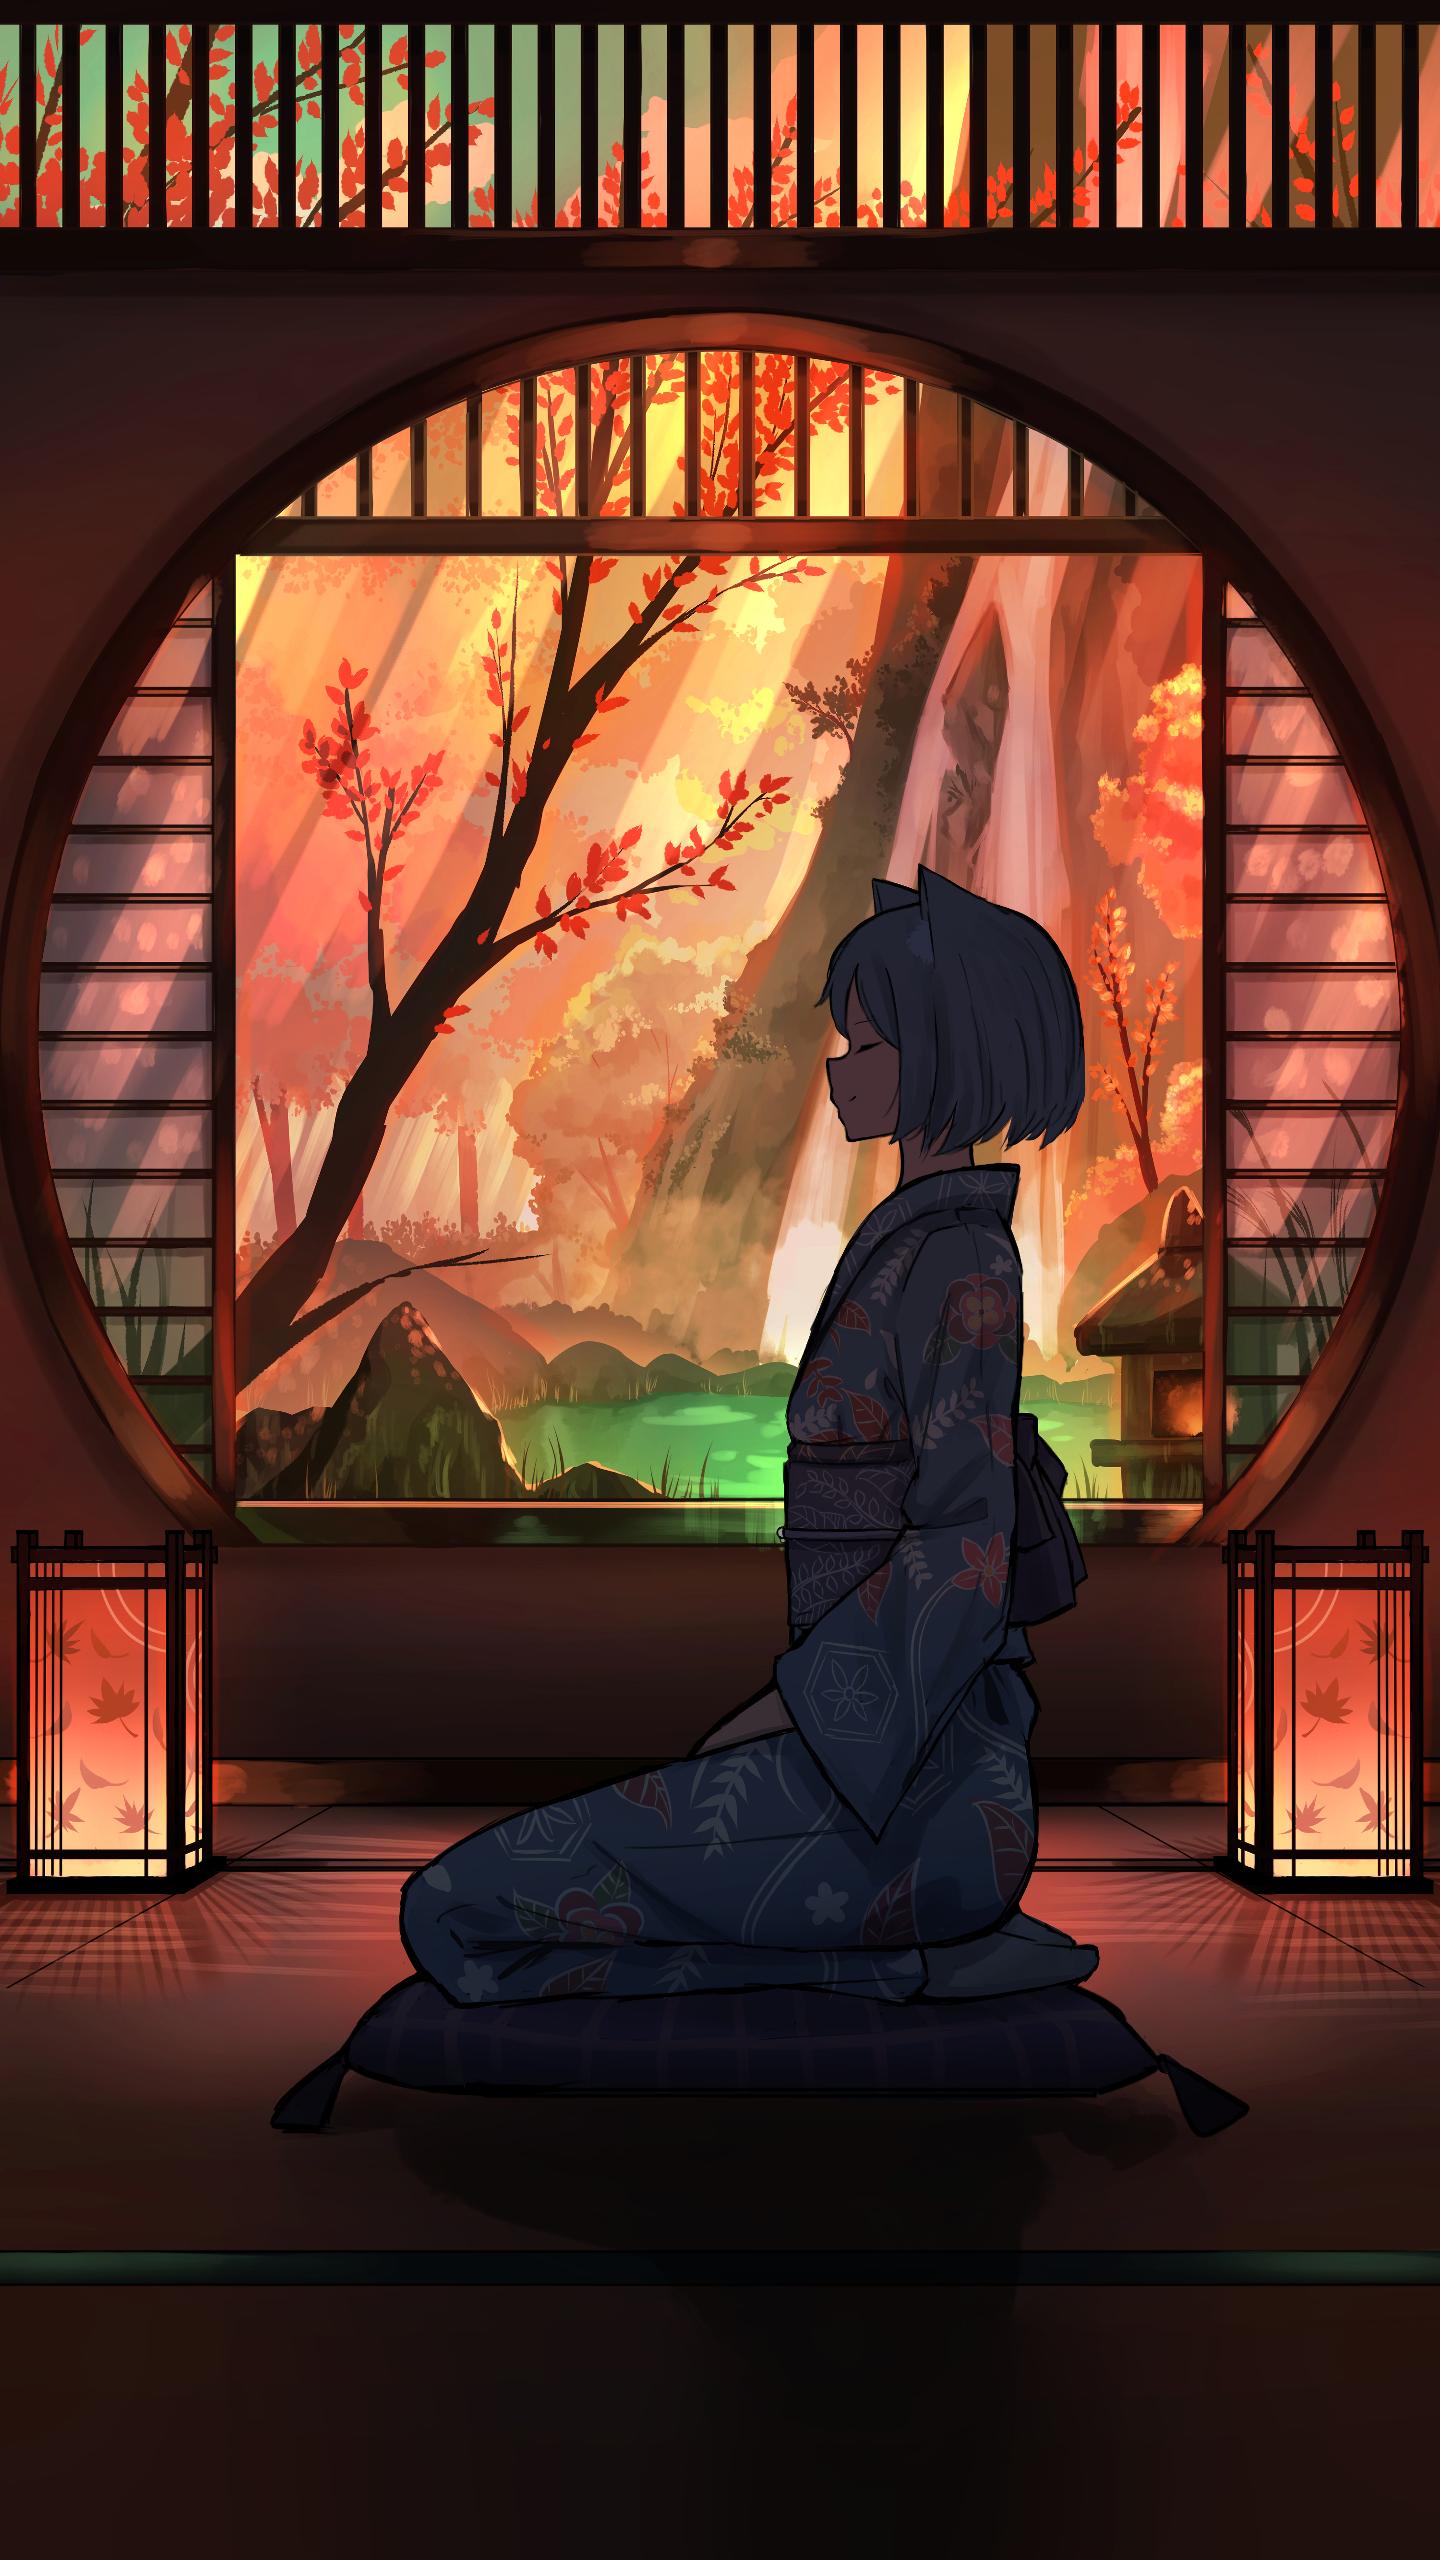 2020 Original 1440x2560 Anime Scenery Anime Art Beautiful Cool Anime Wallpapers